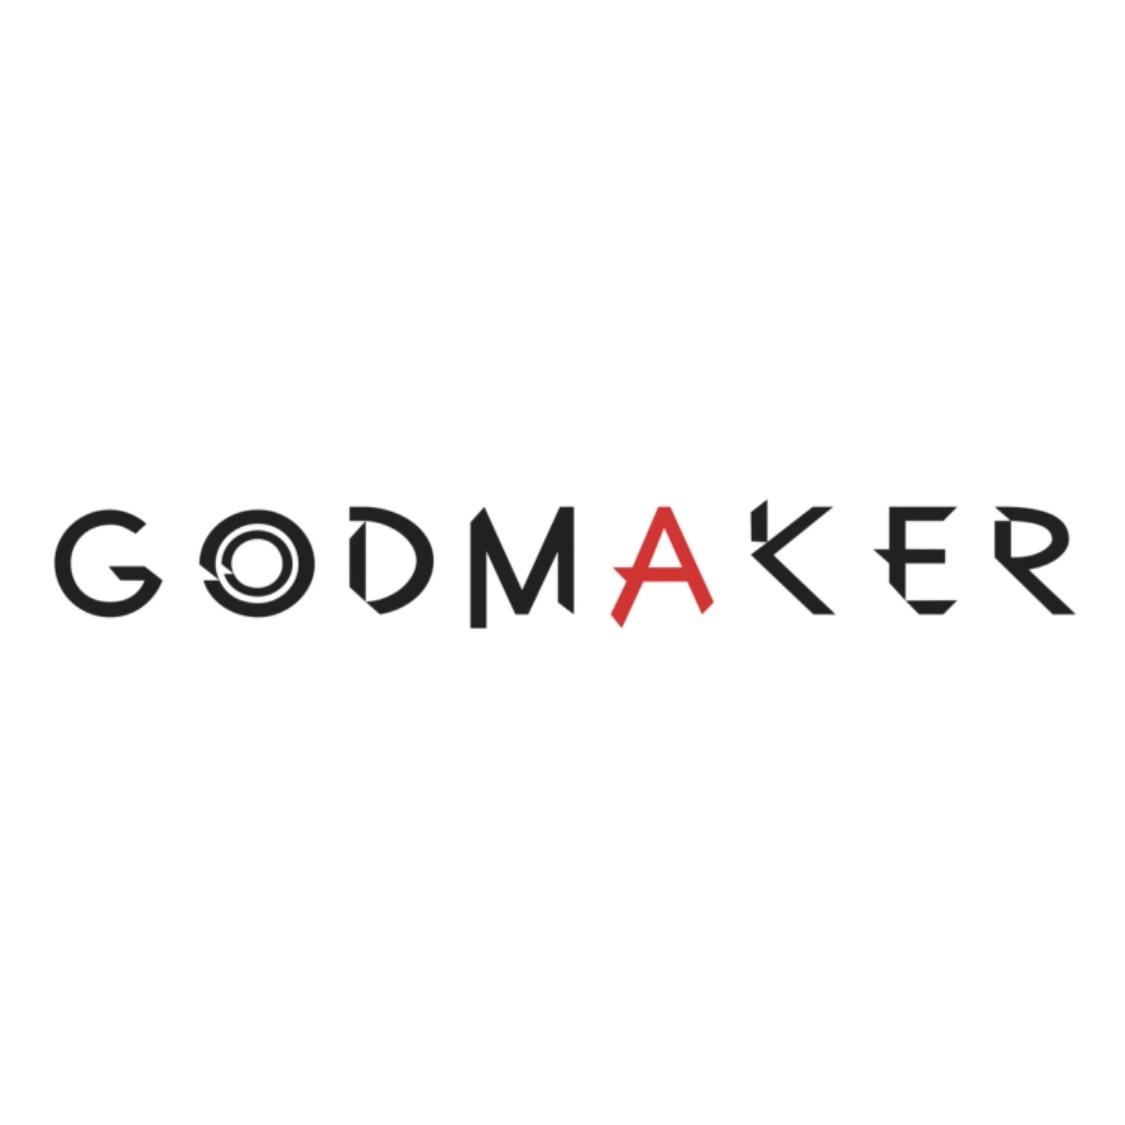 GodMakerII